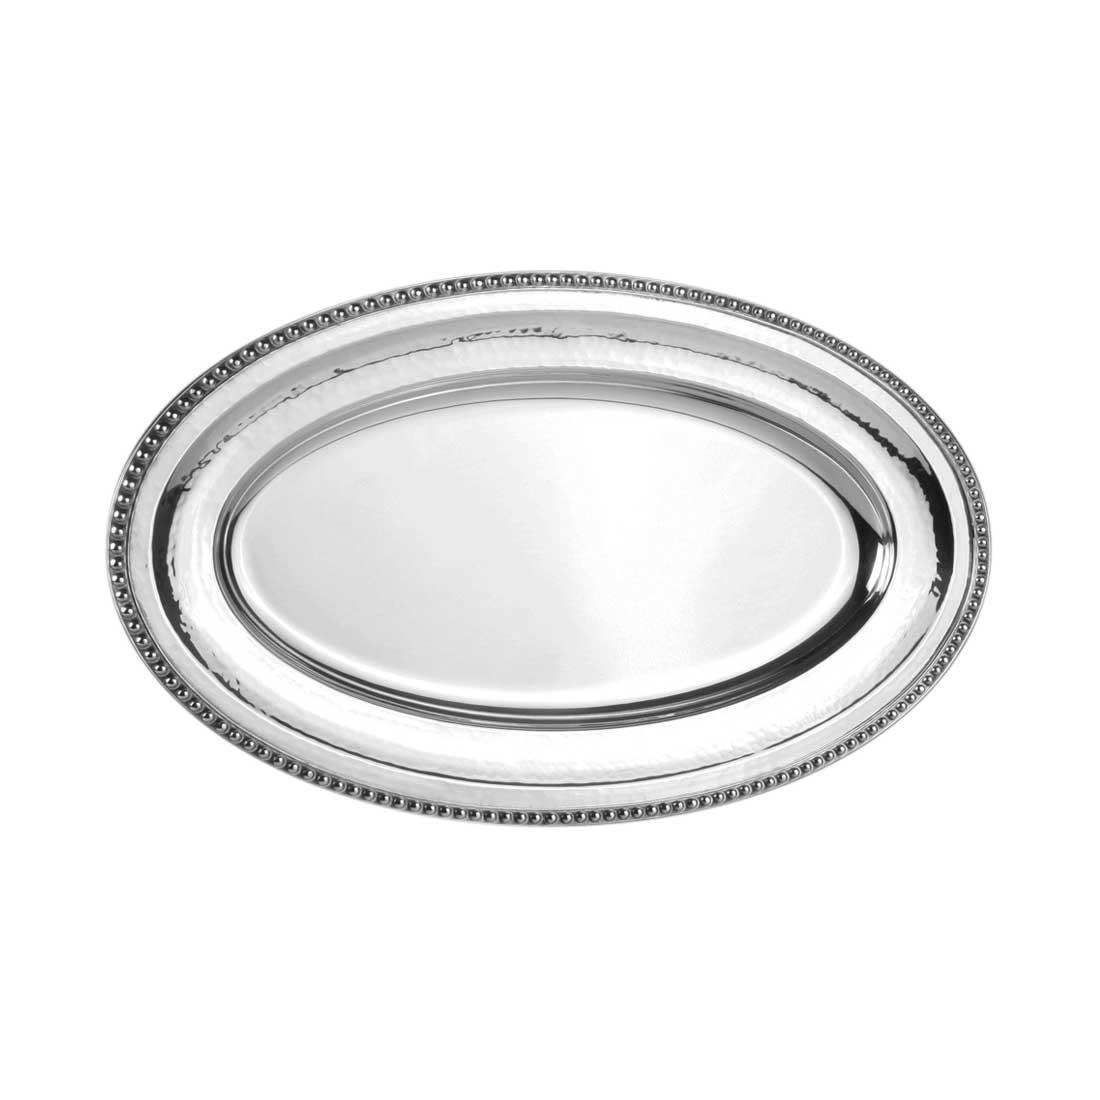 Orfevra Silverplated Tableware